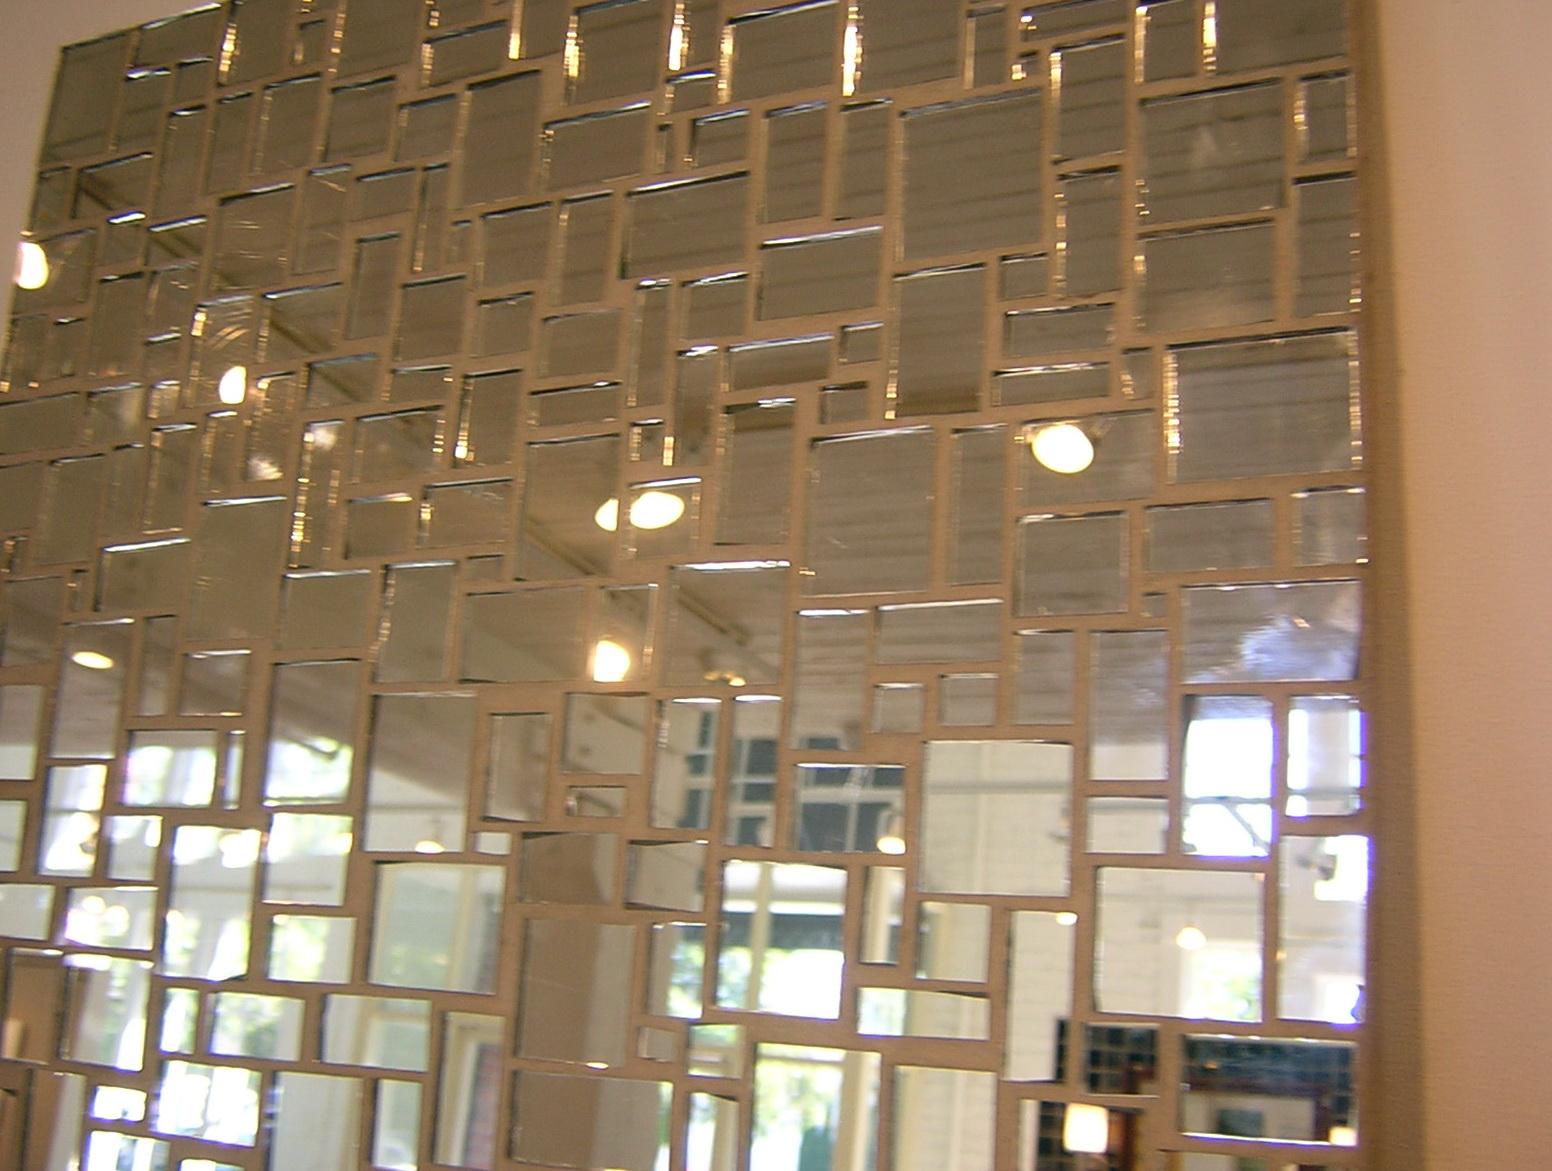 self adhesive mirror wall tiles home design ideas. Black Bedroom Furniture Sets. Home Design Ideas